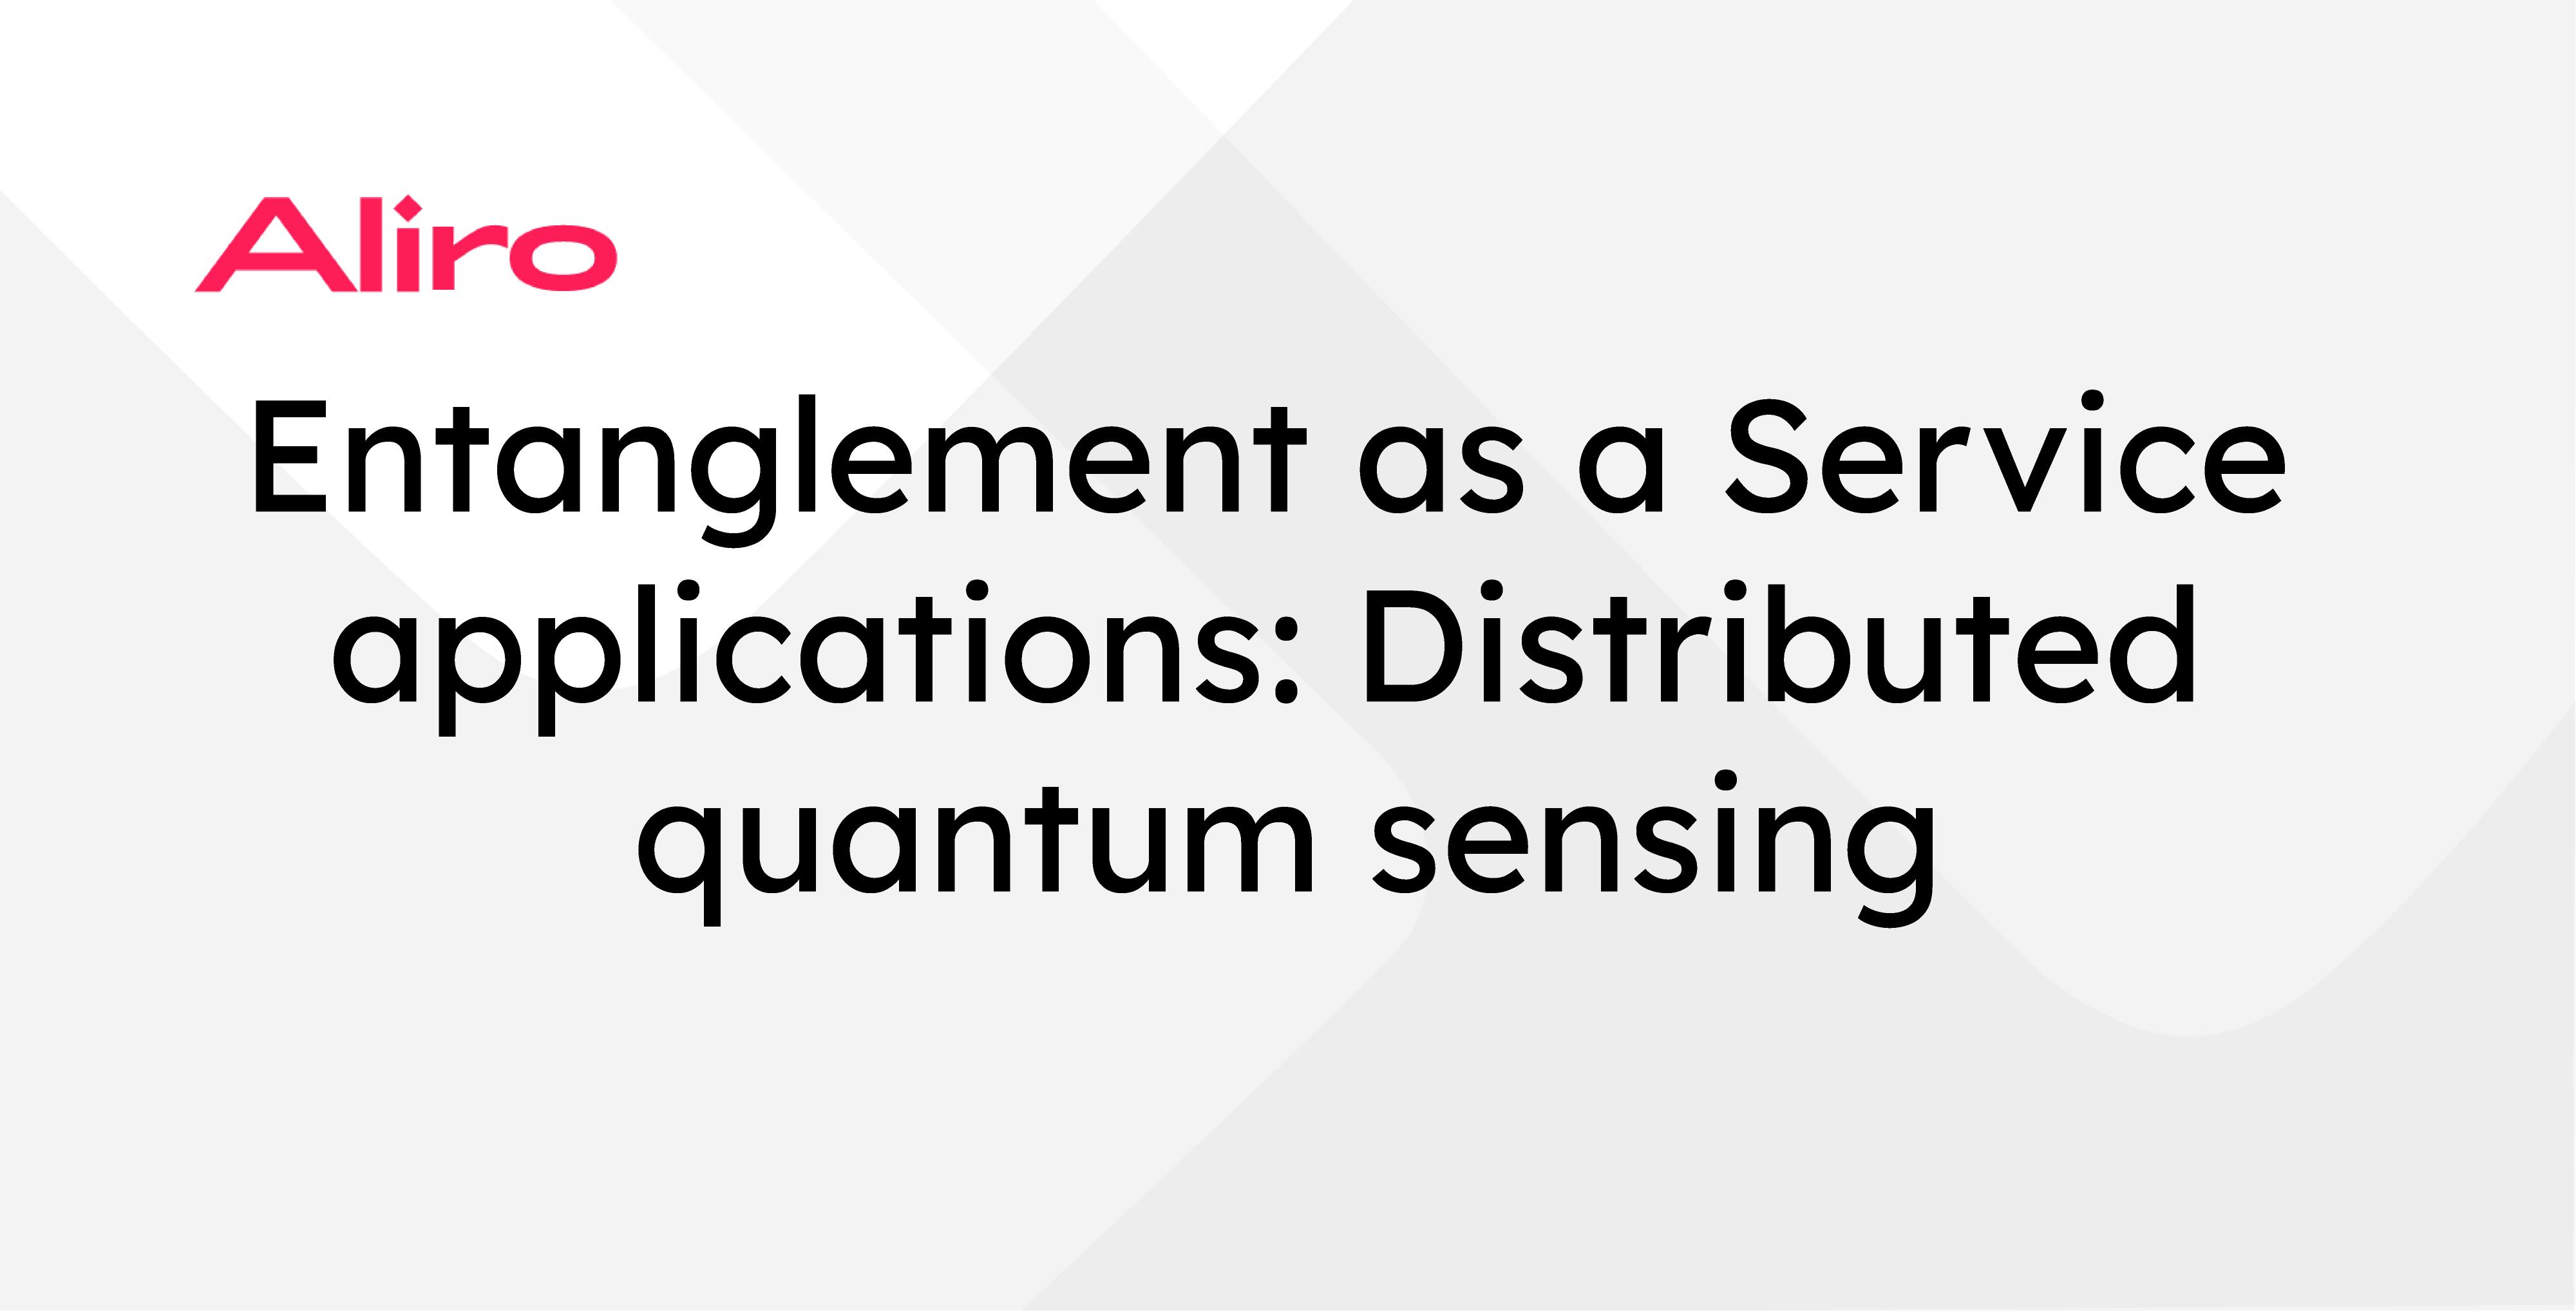 Entanglement as a Service applications: Distributed quantum sensing